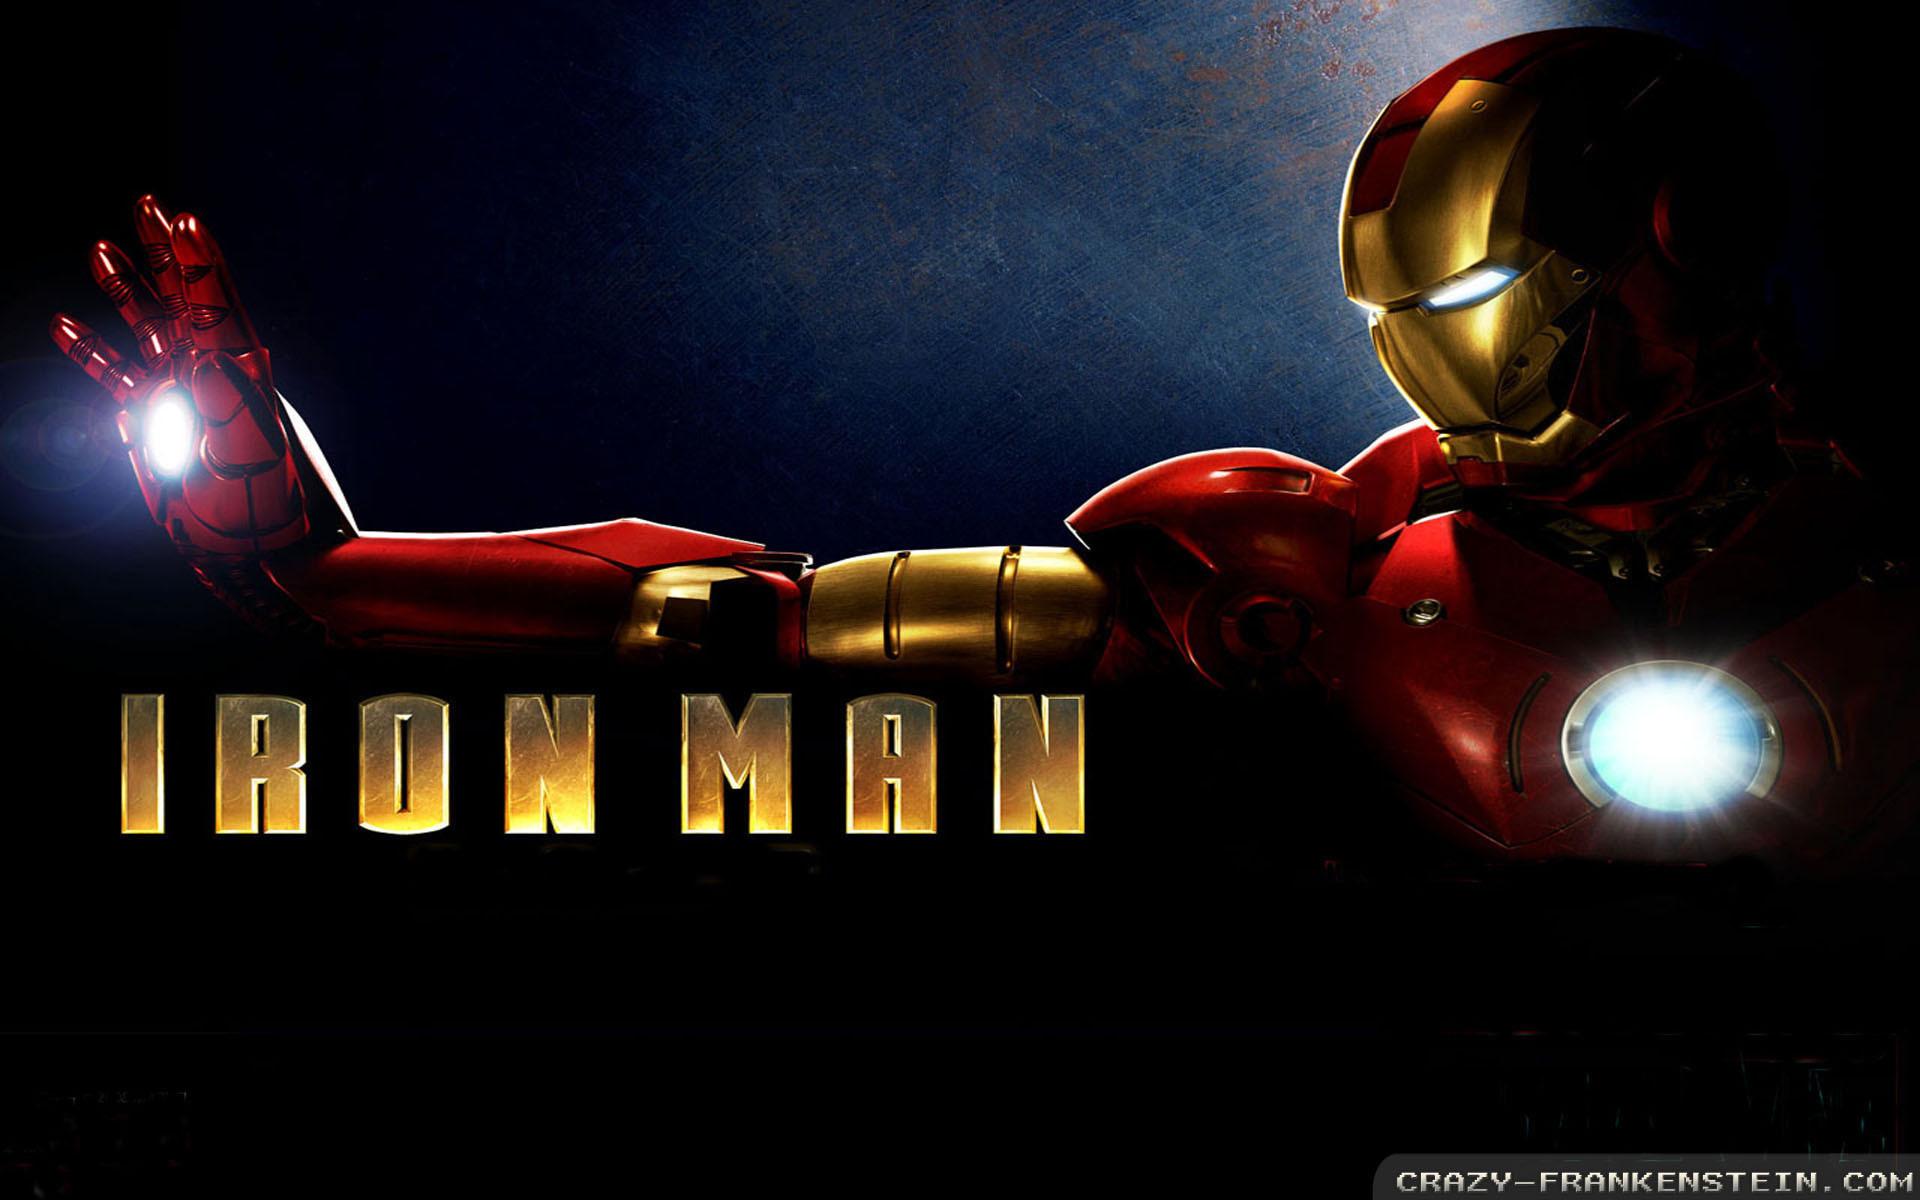 Iron Man 2 Black Background Movies Wallpaper: Iron Man Wallpapers (69+ Images